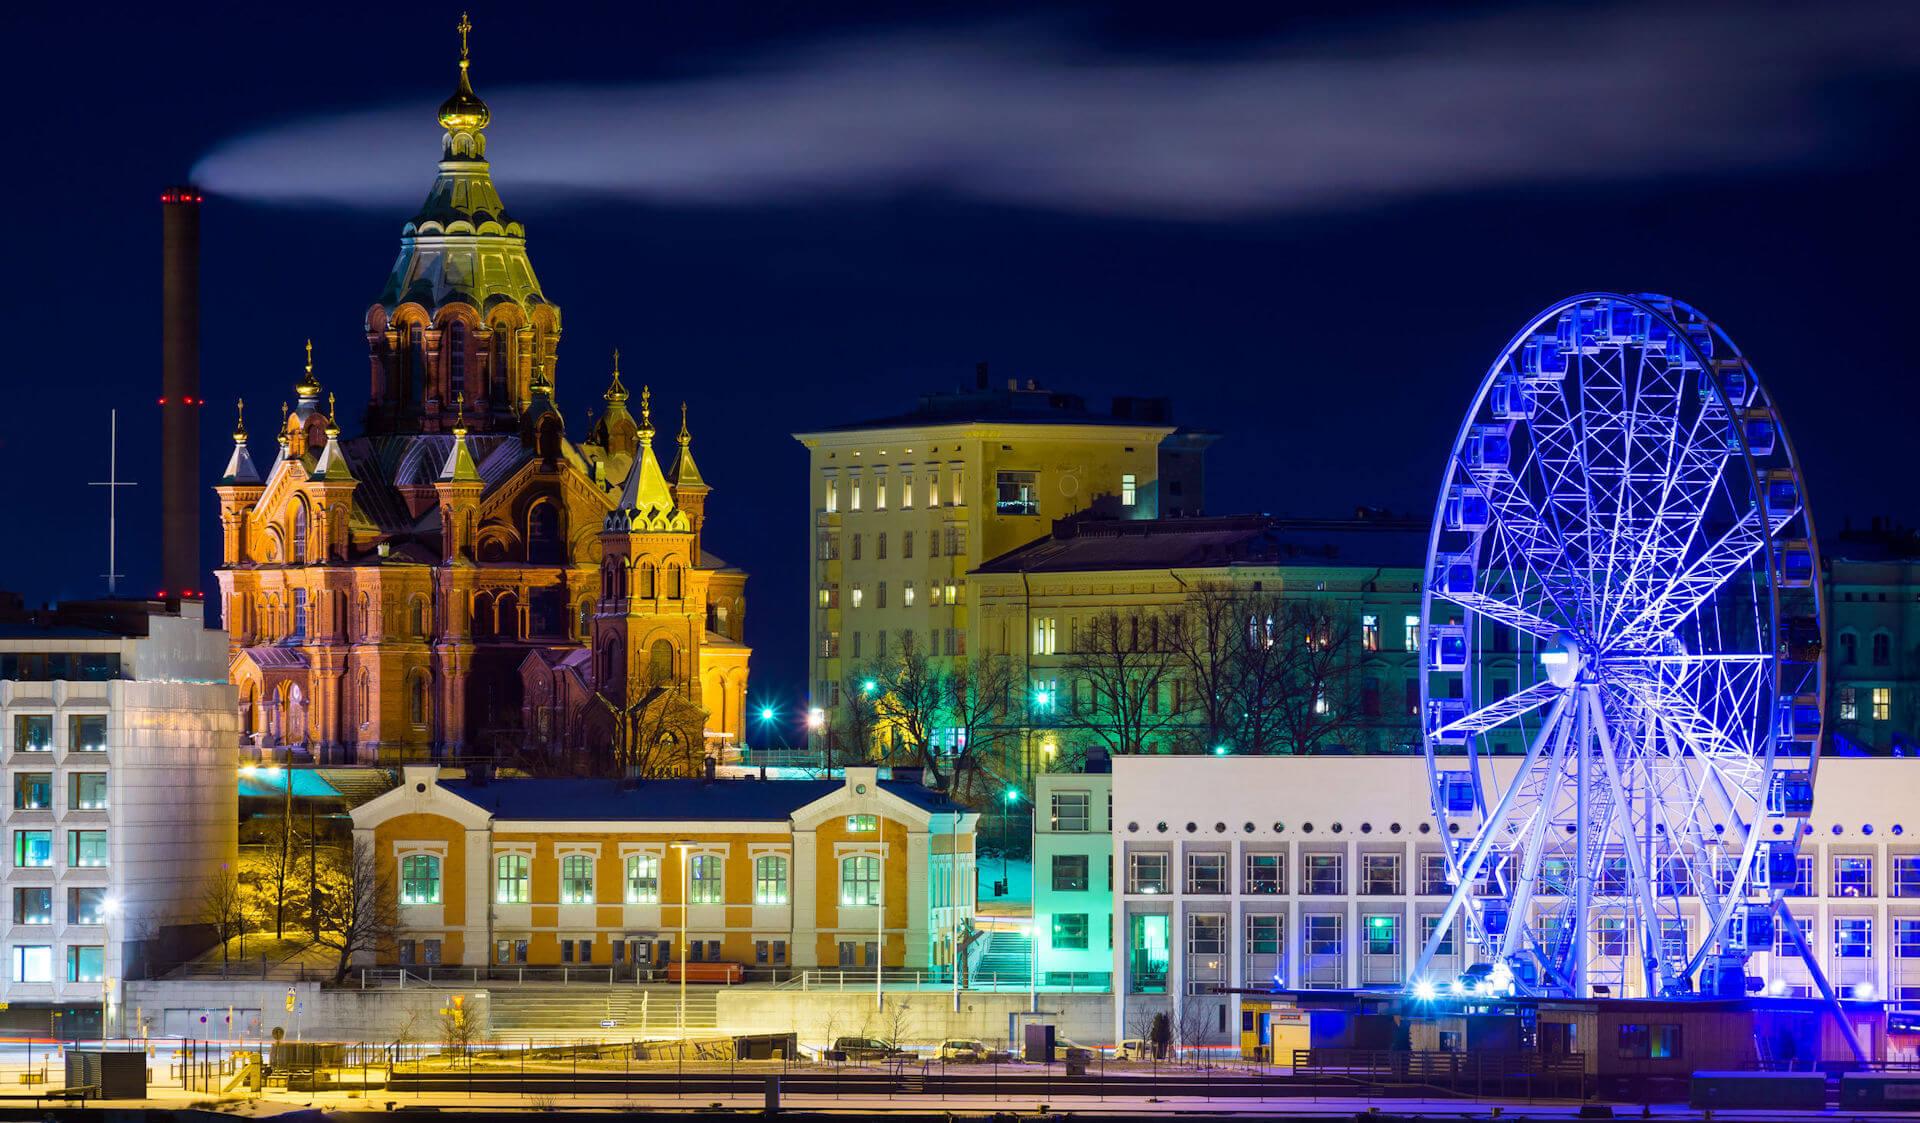 •20-24 January, 2020 - Helsinki